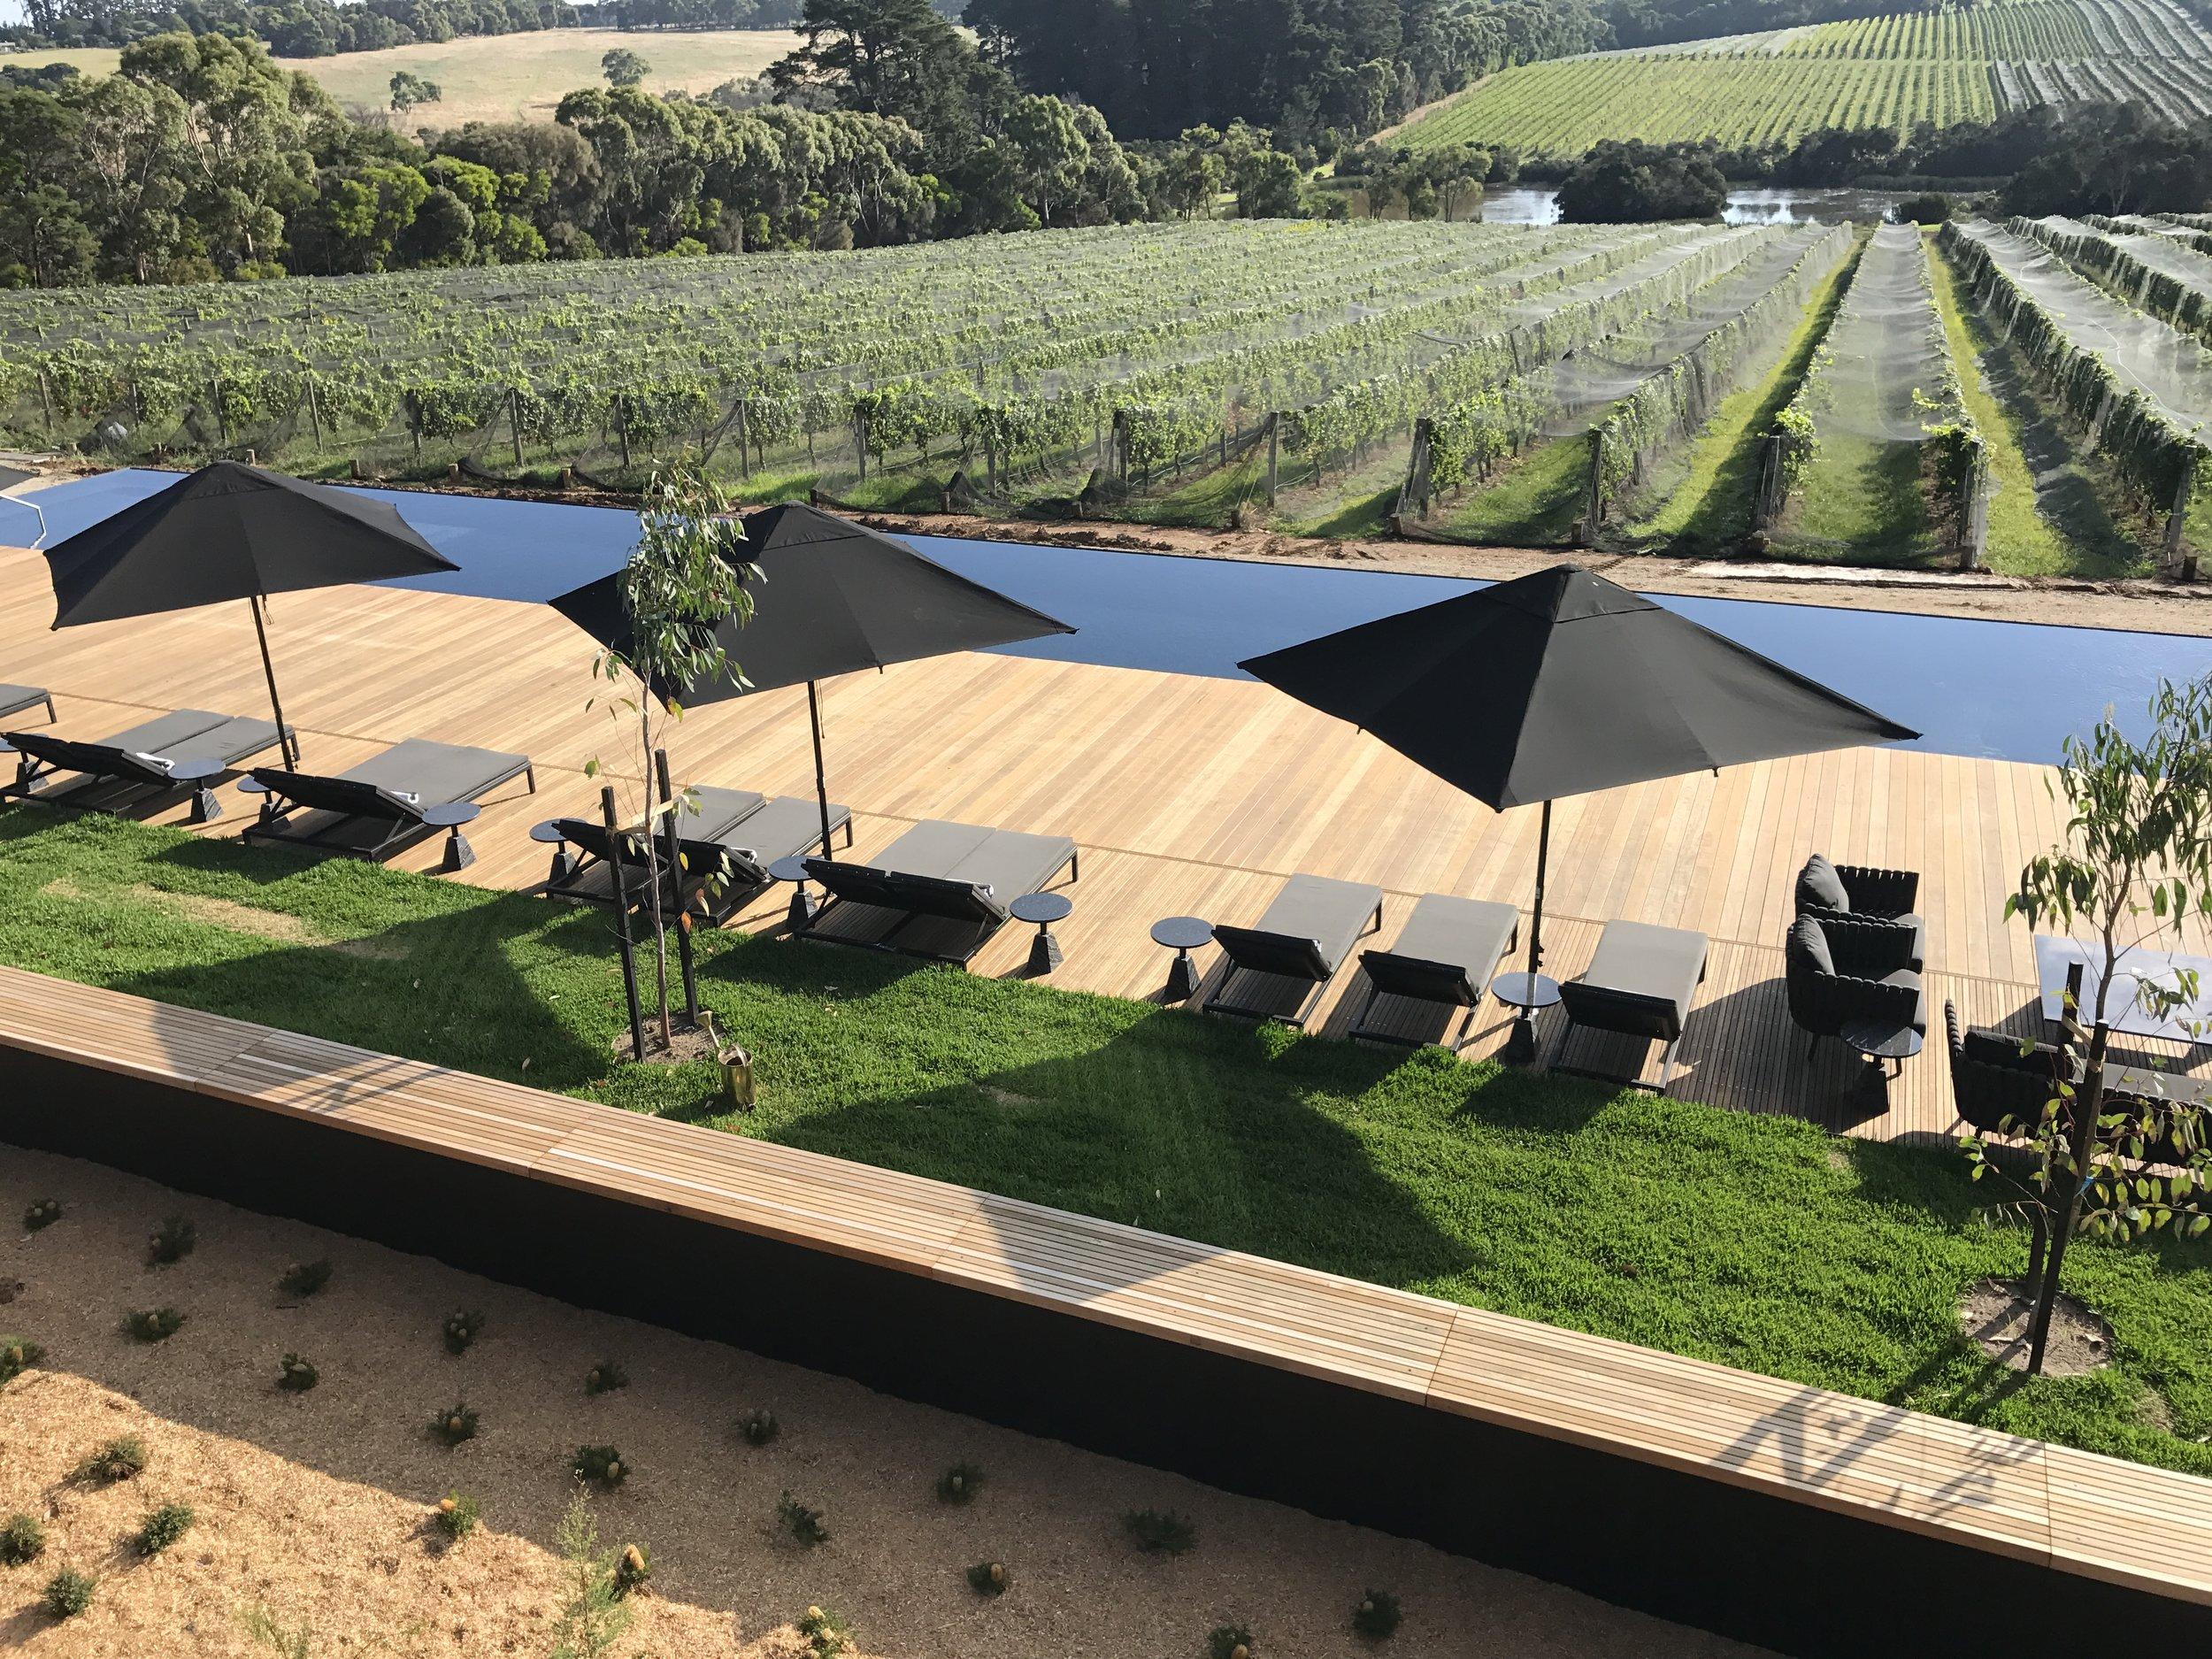 Jackalope : The Mornington Peninsula 's new boutique luxury art hotel. A destination showcase, with serious design cred, in Victoria's coastal wine region.